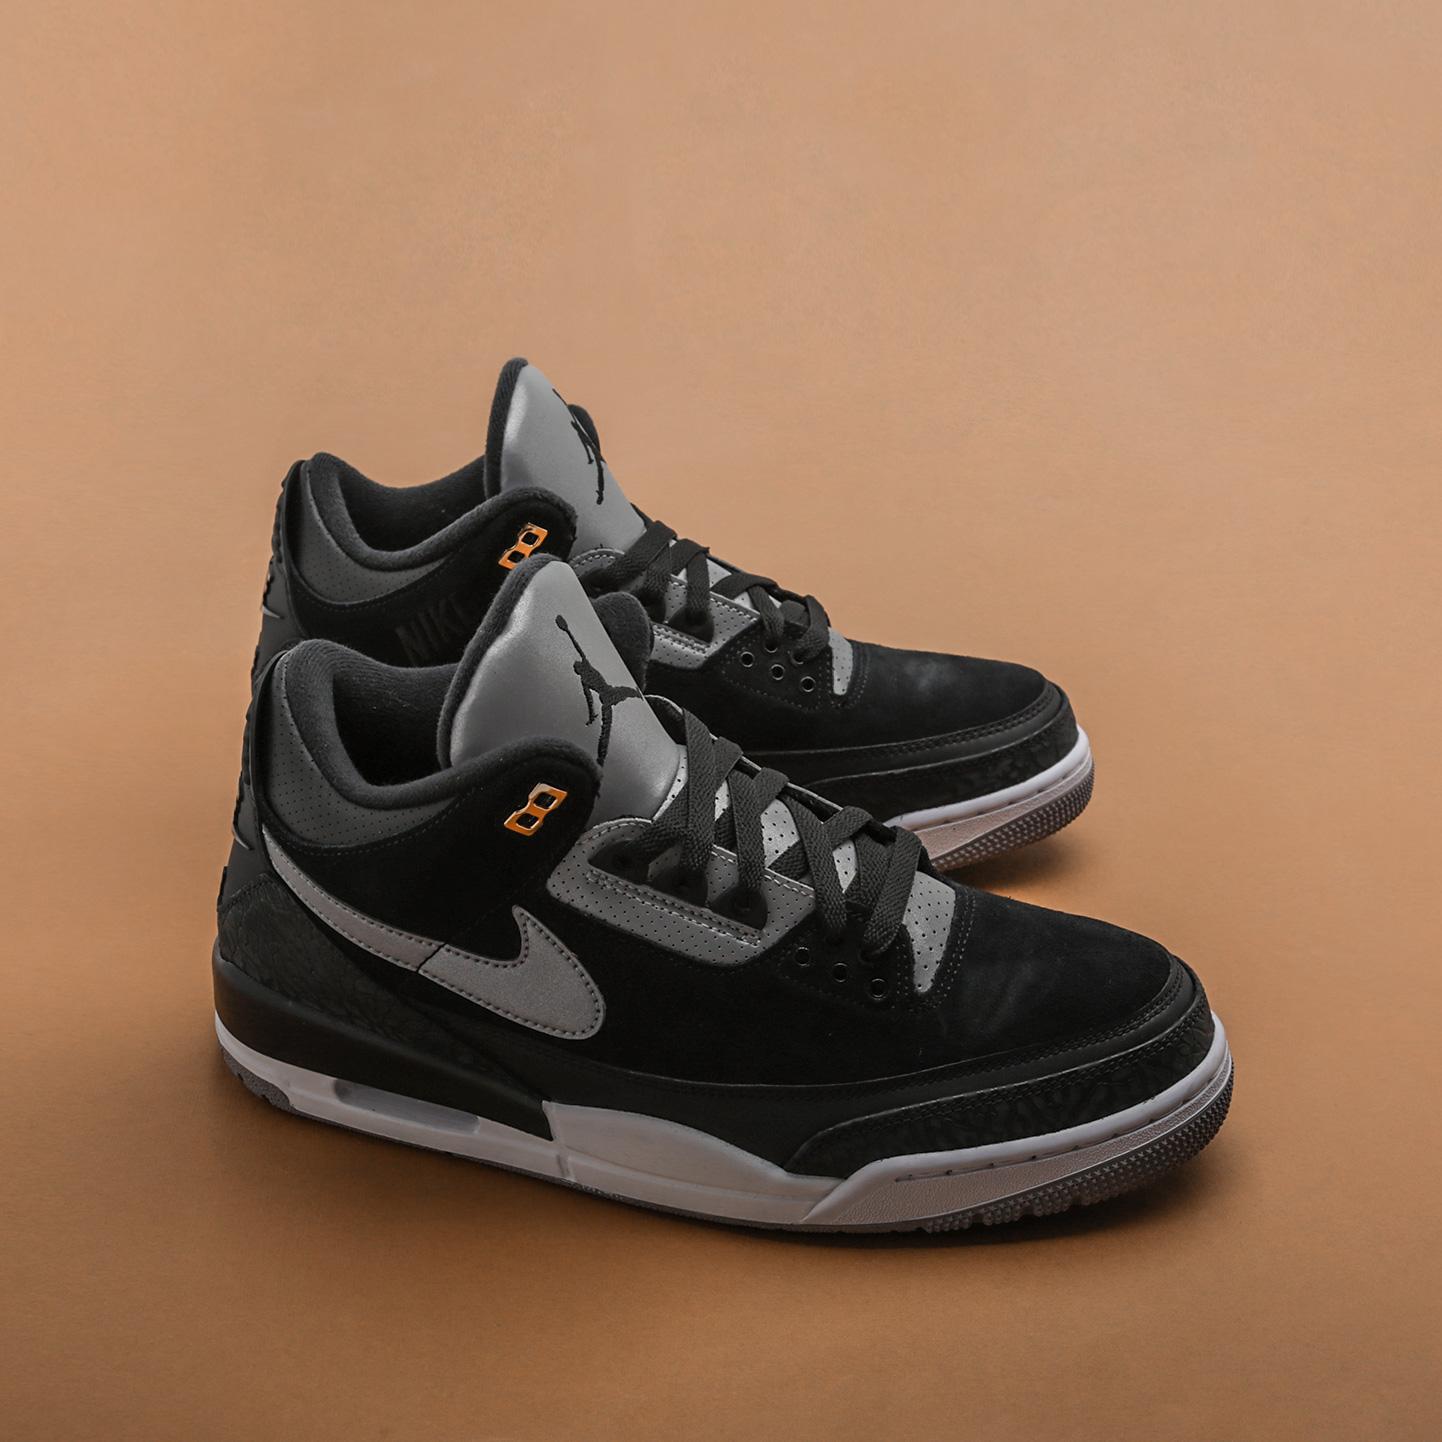 Кроссовки Jordan 3 Retro TH